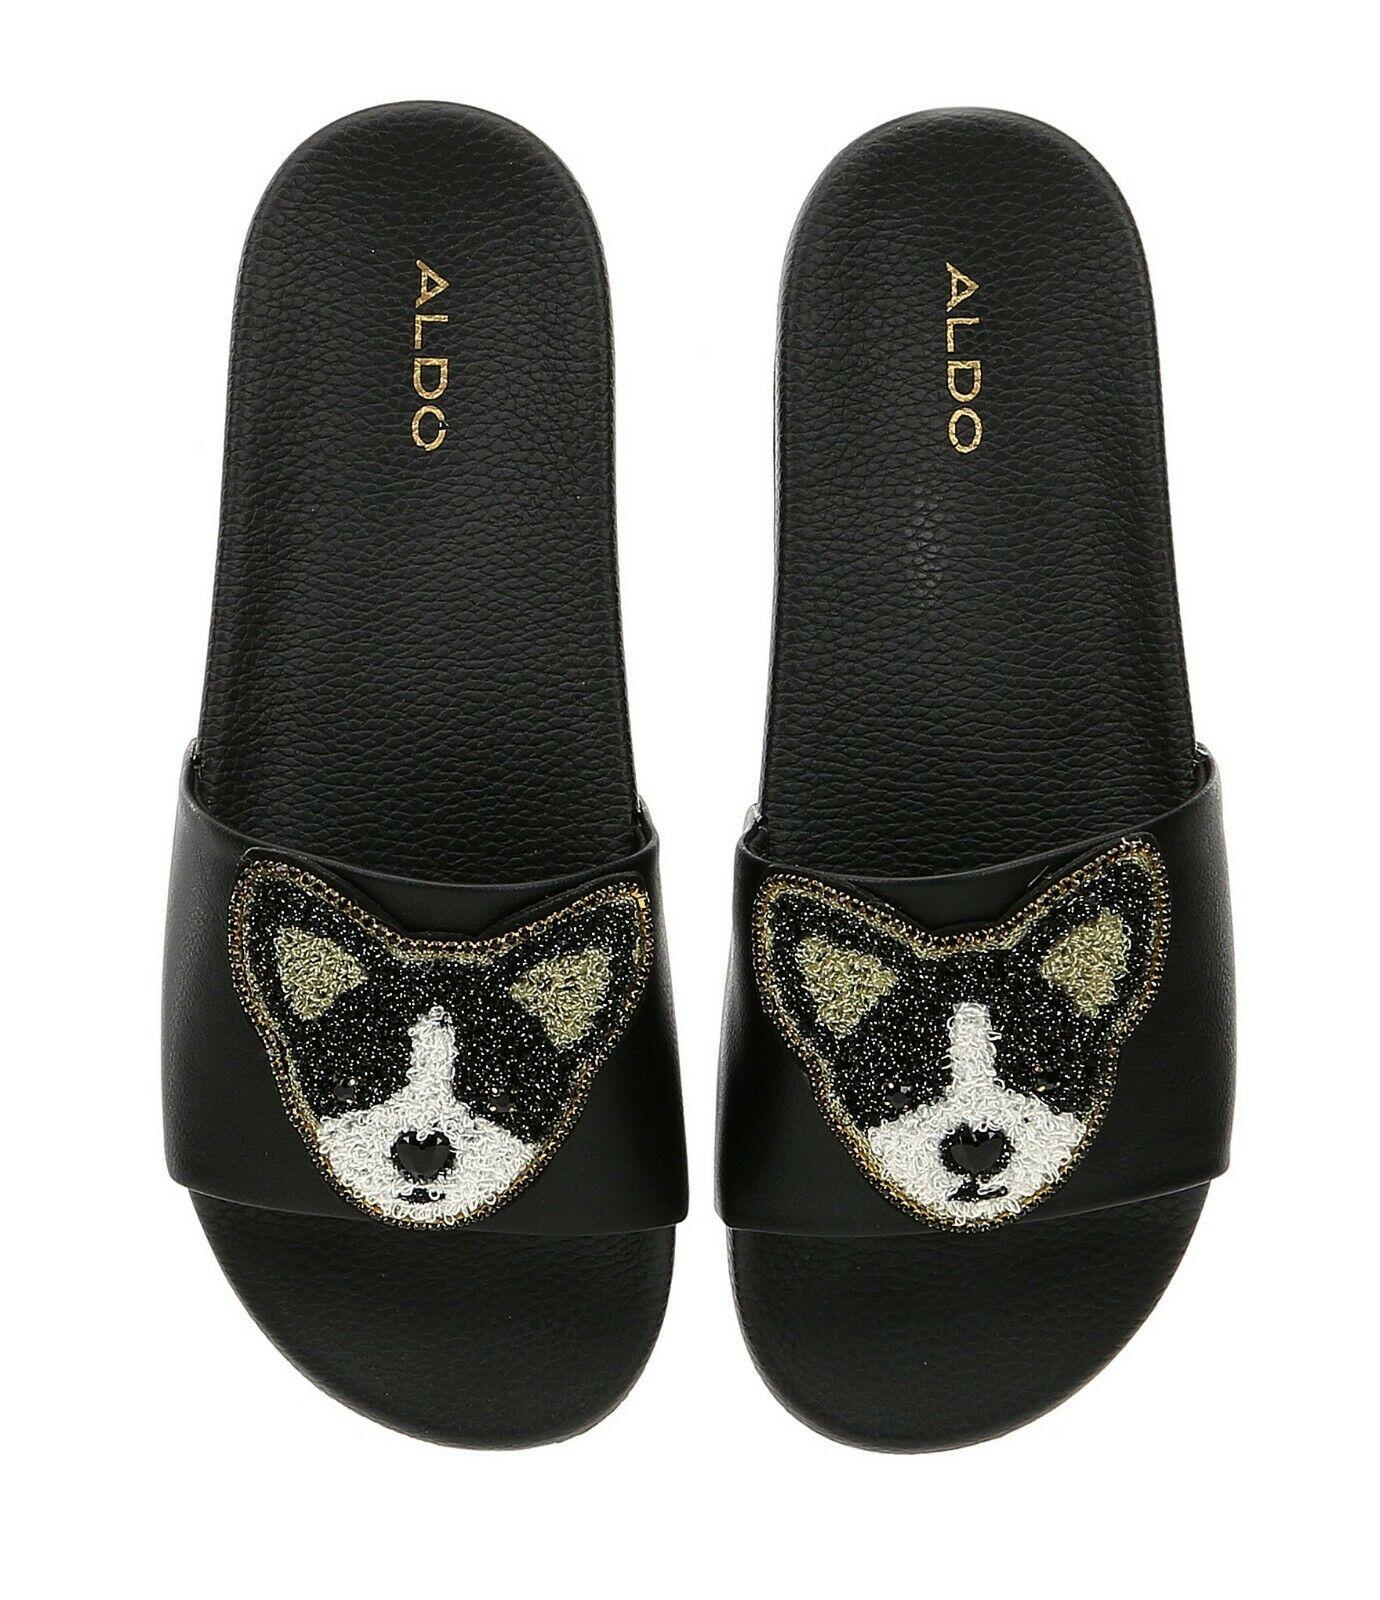 Aldo Mujer Mujer Mujer Grini Boston Terrier Bulldog francés Enjoyado diapositiva Sandalia Zapato 8.5 M  alta calidad